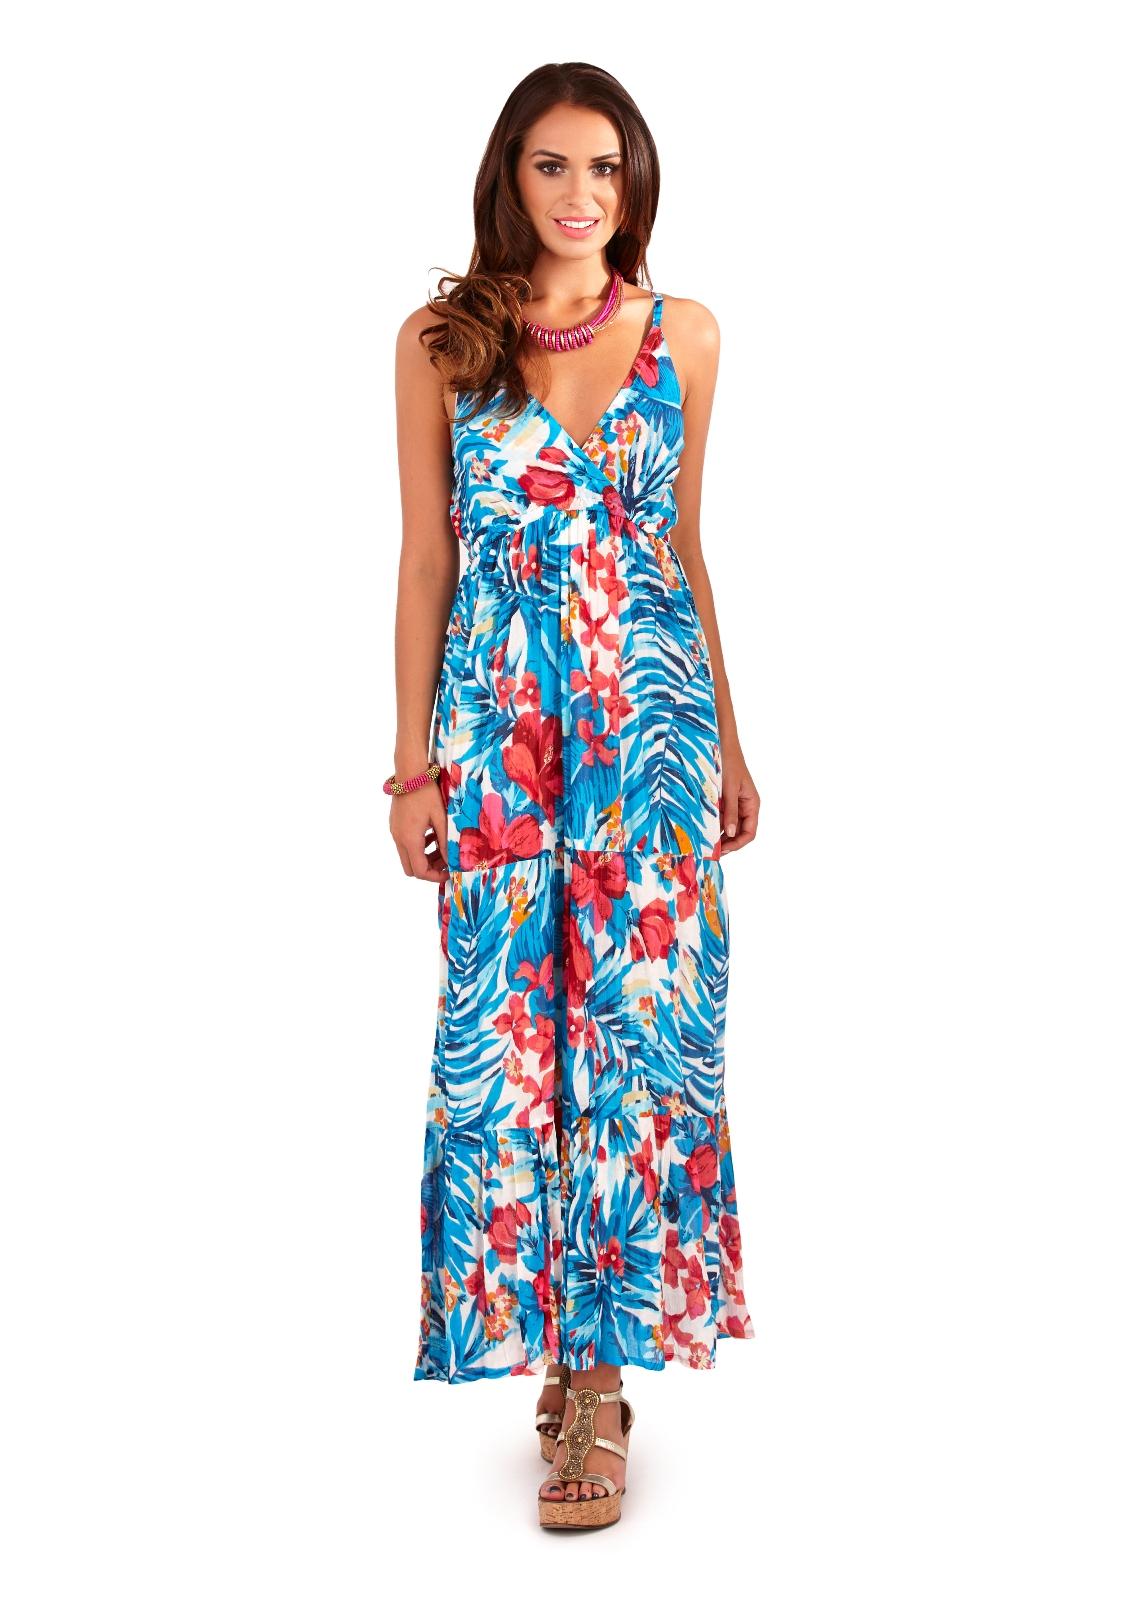 Womens Maxi Dress V Neck Full Length Summer Dress Ladies Size 8-16 ... 9dce402a3